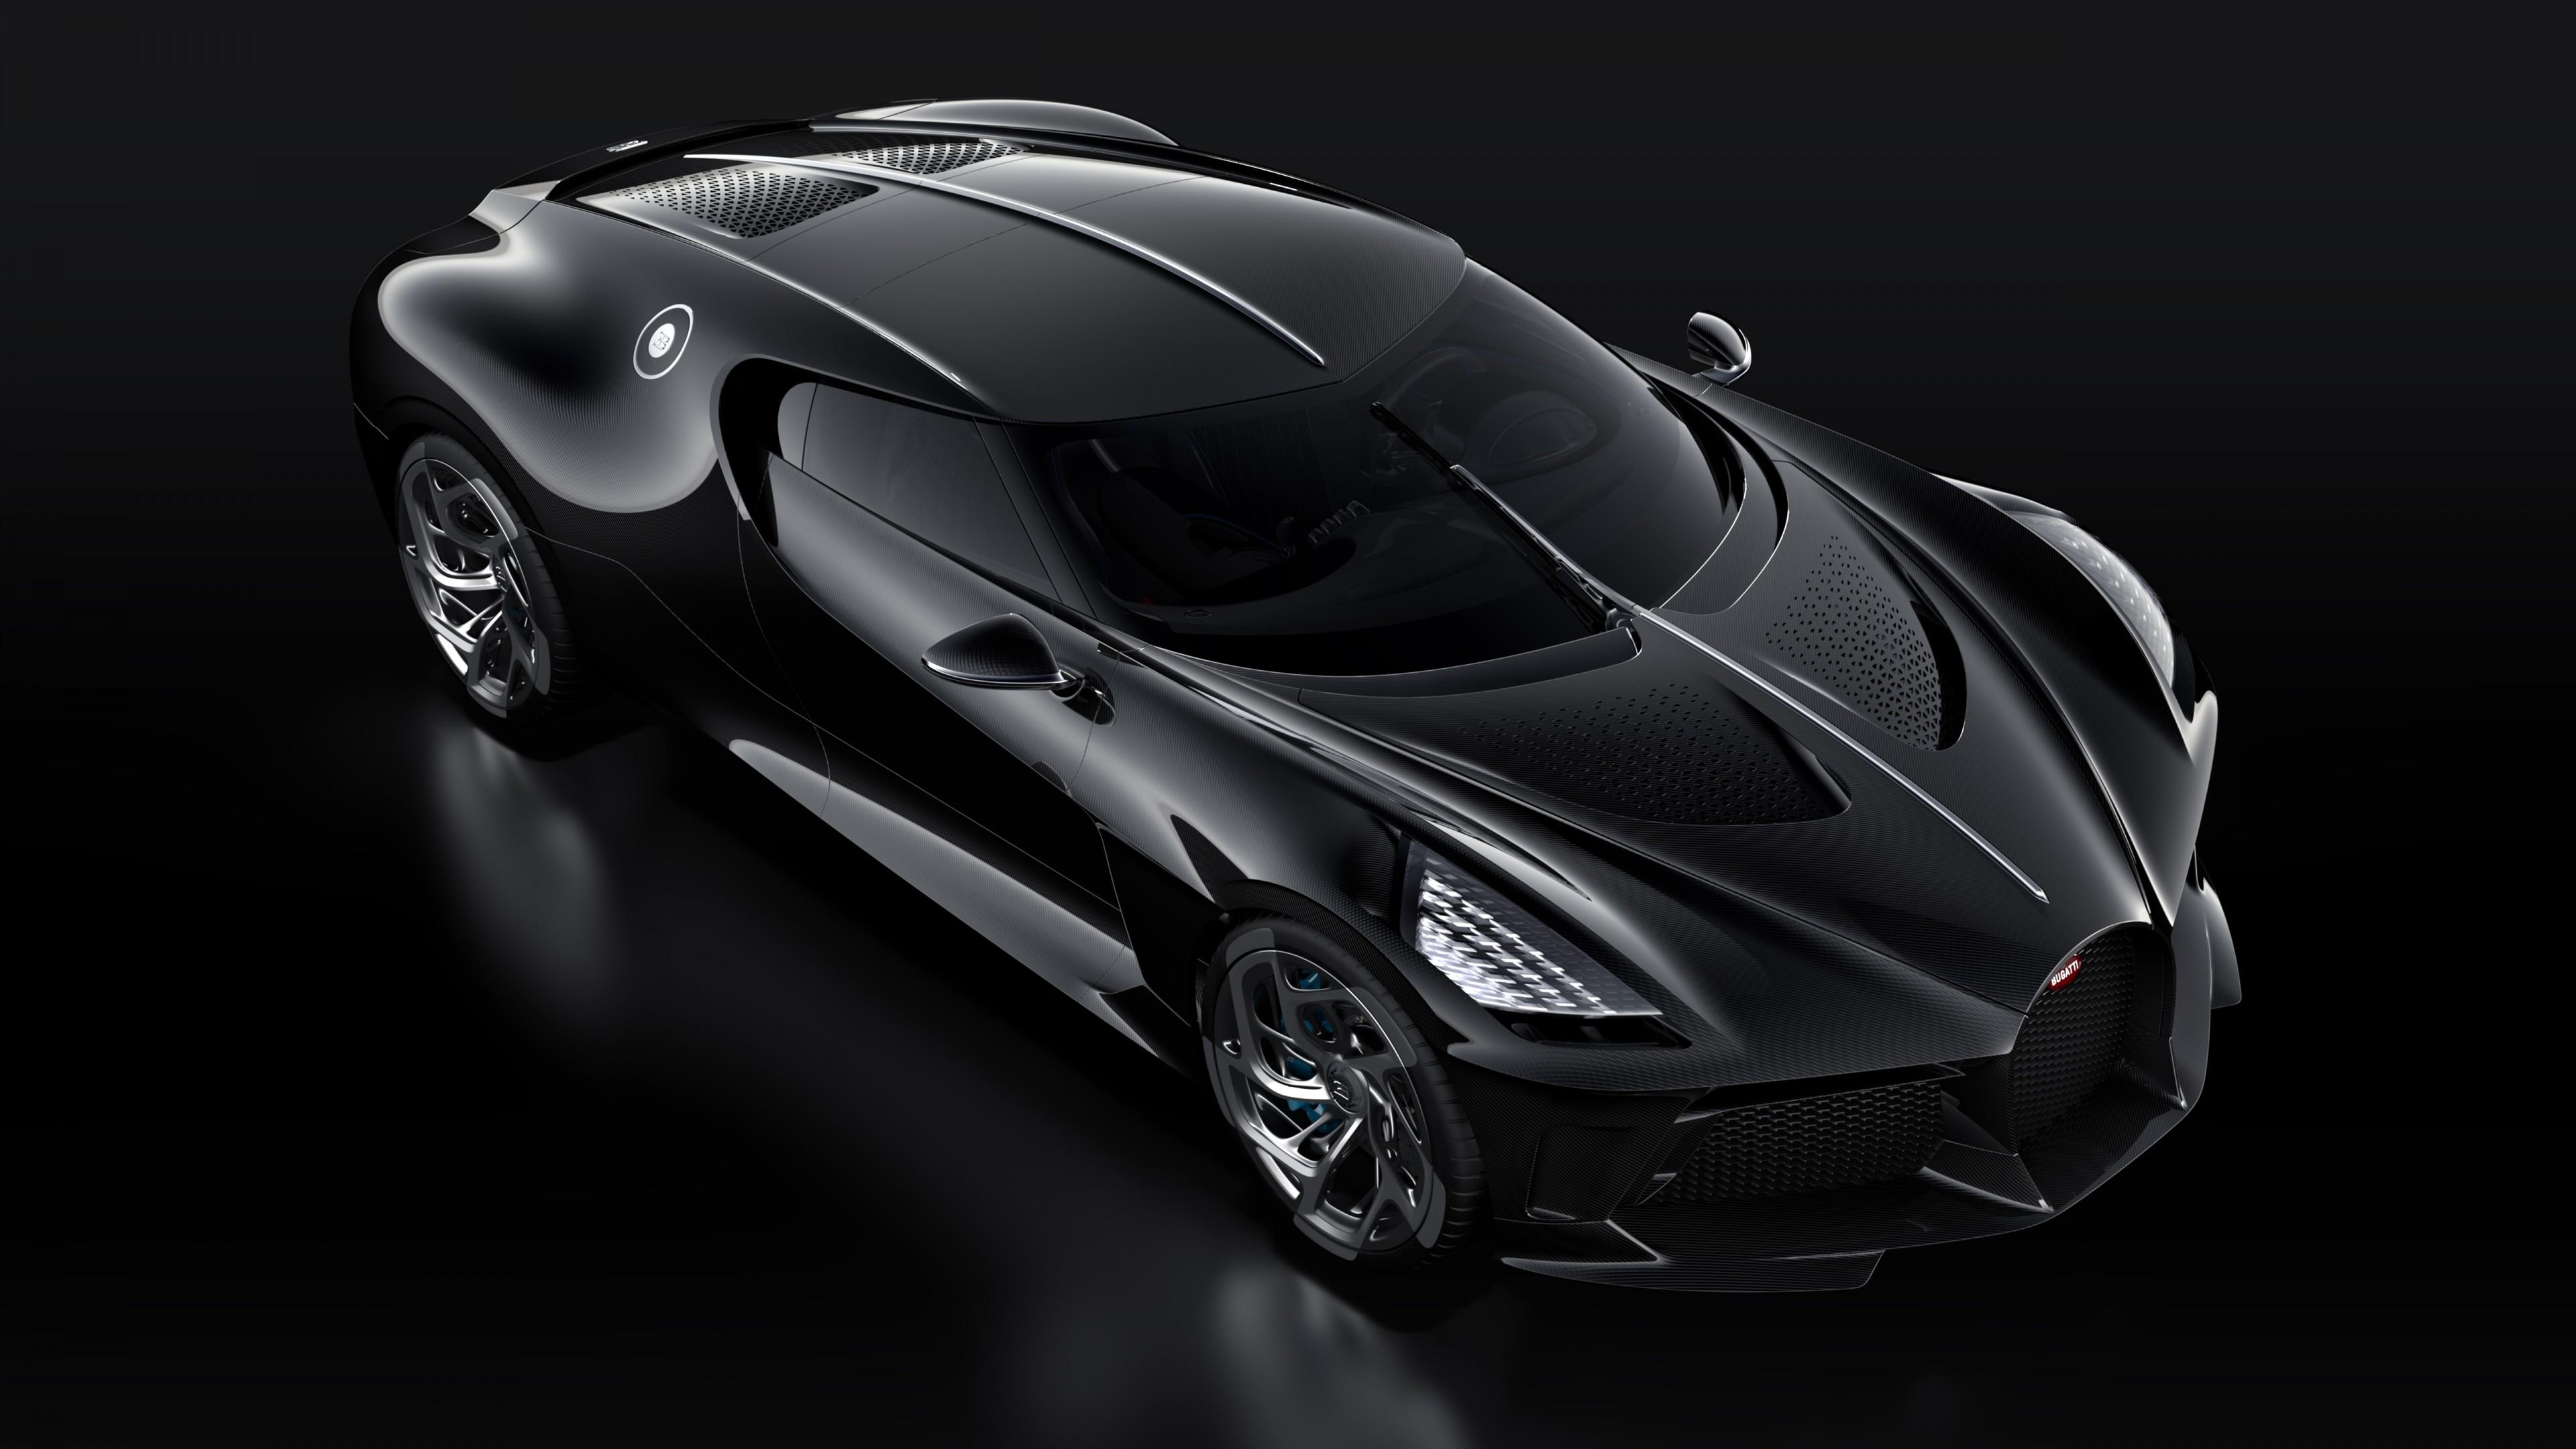 Black Supercar Wallpaper 4k ~ All About Super Cars ...